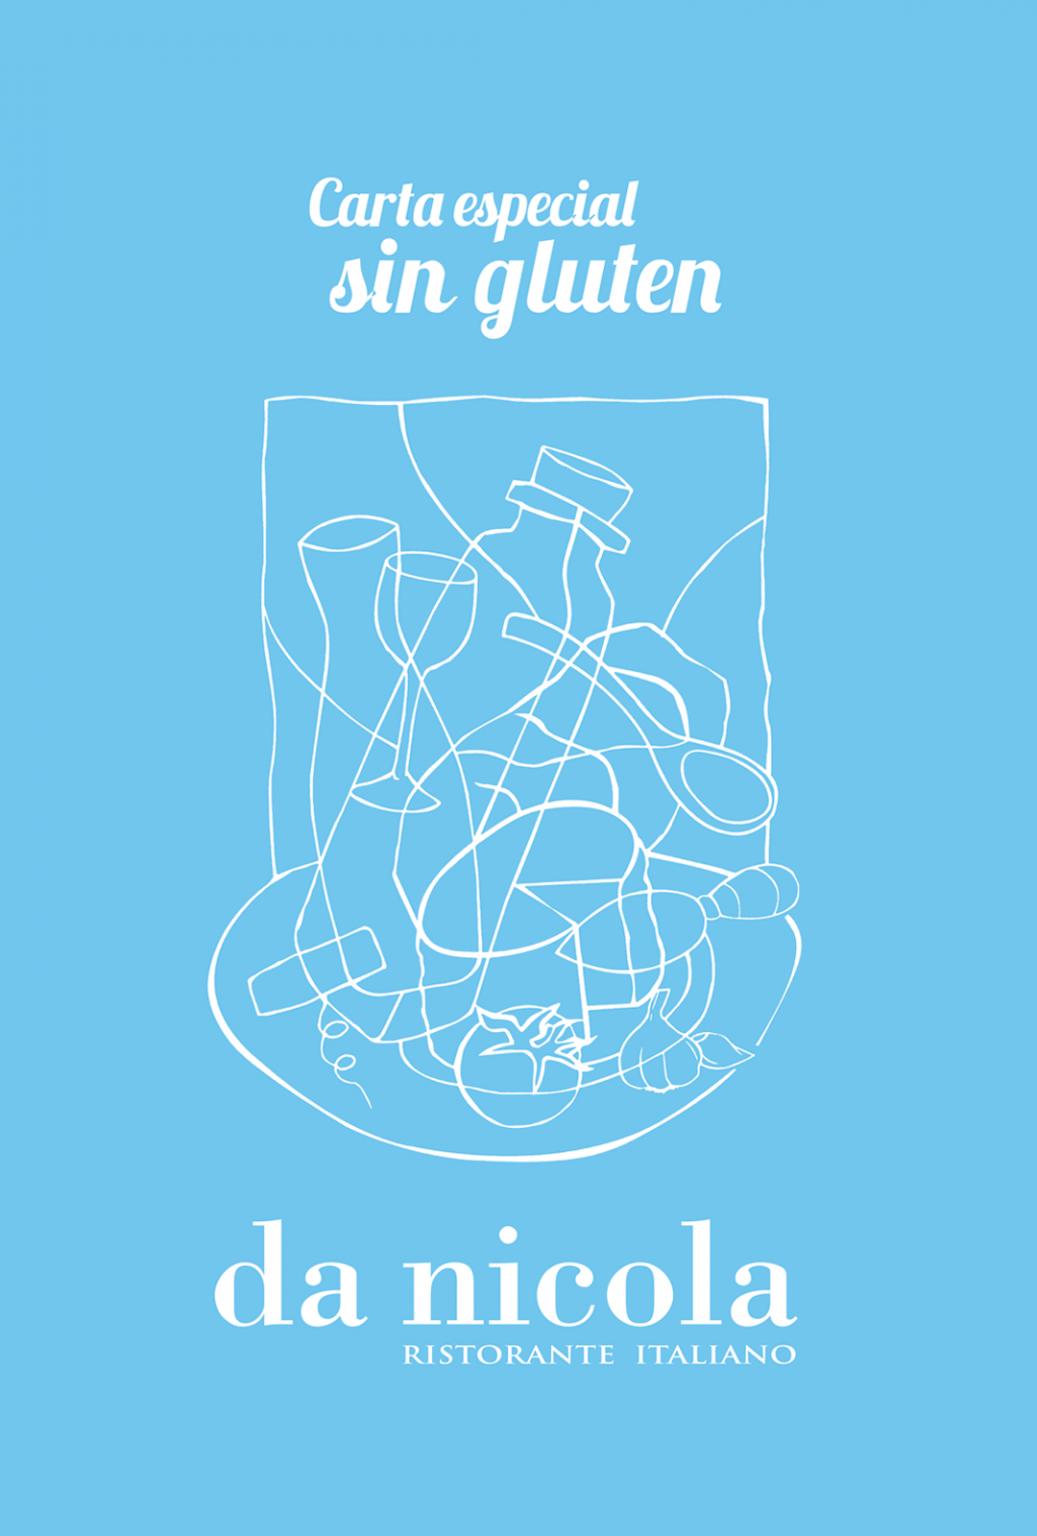 Selector de carta sin gluten